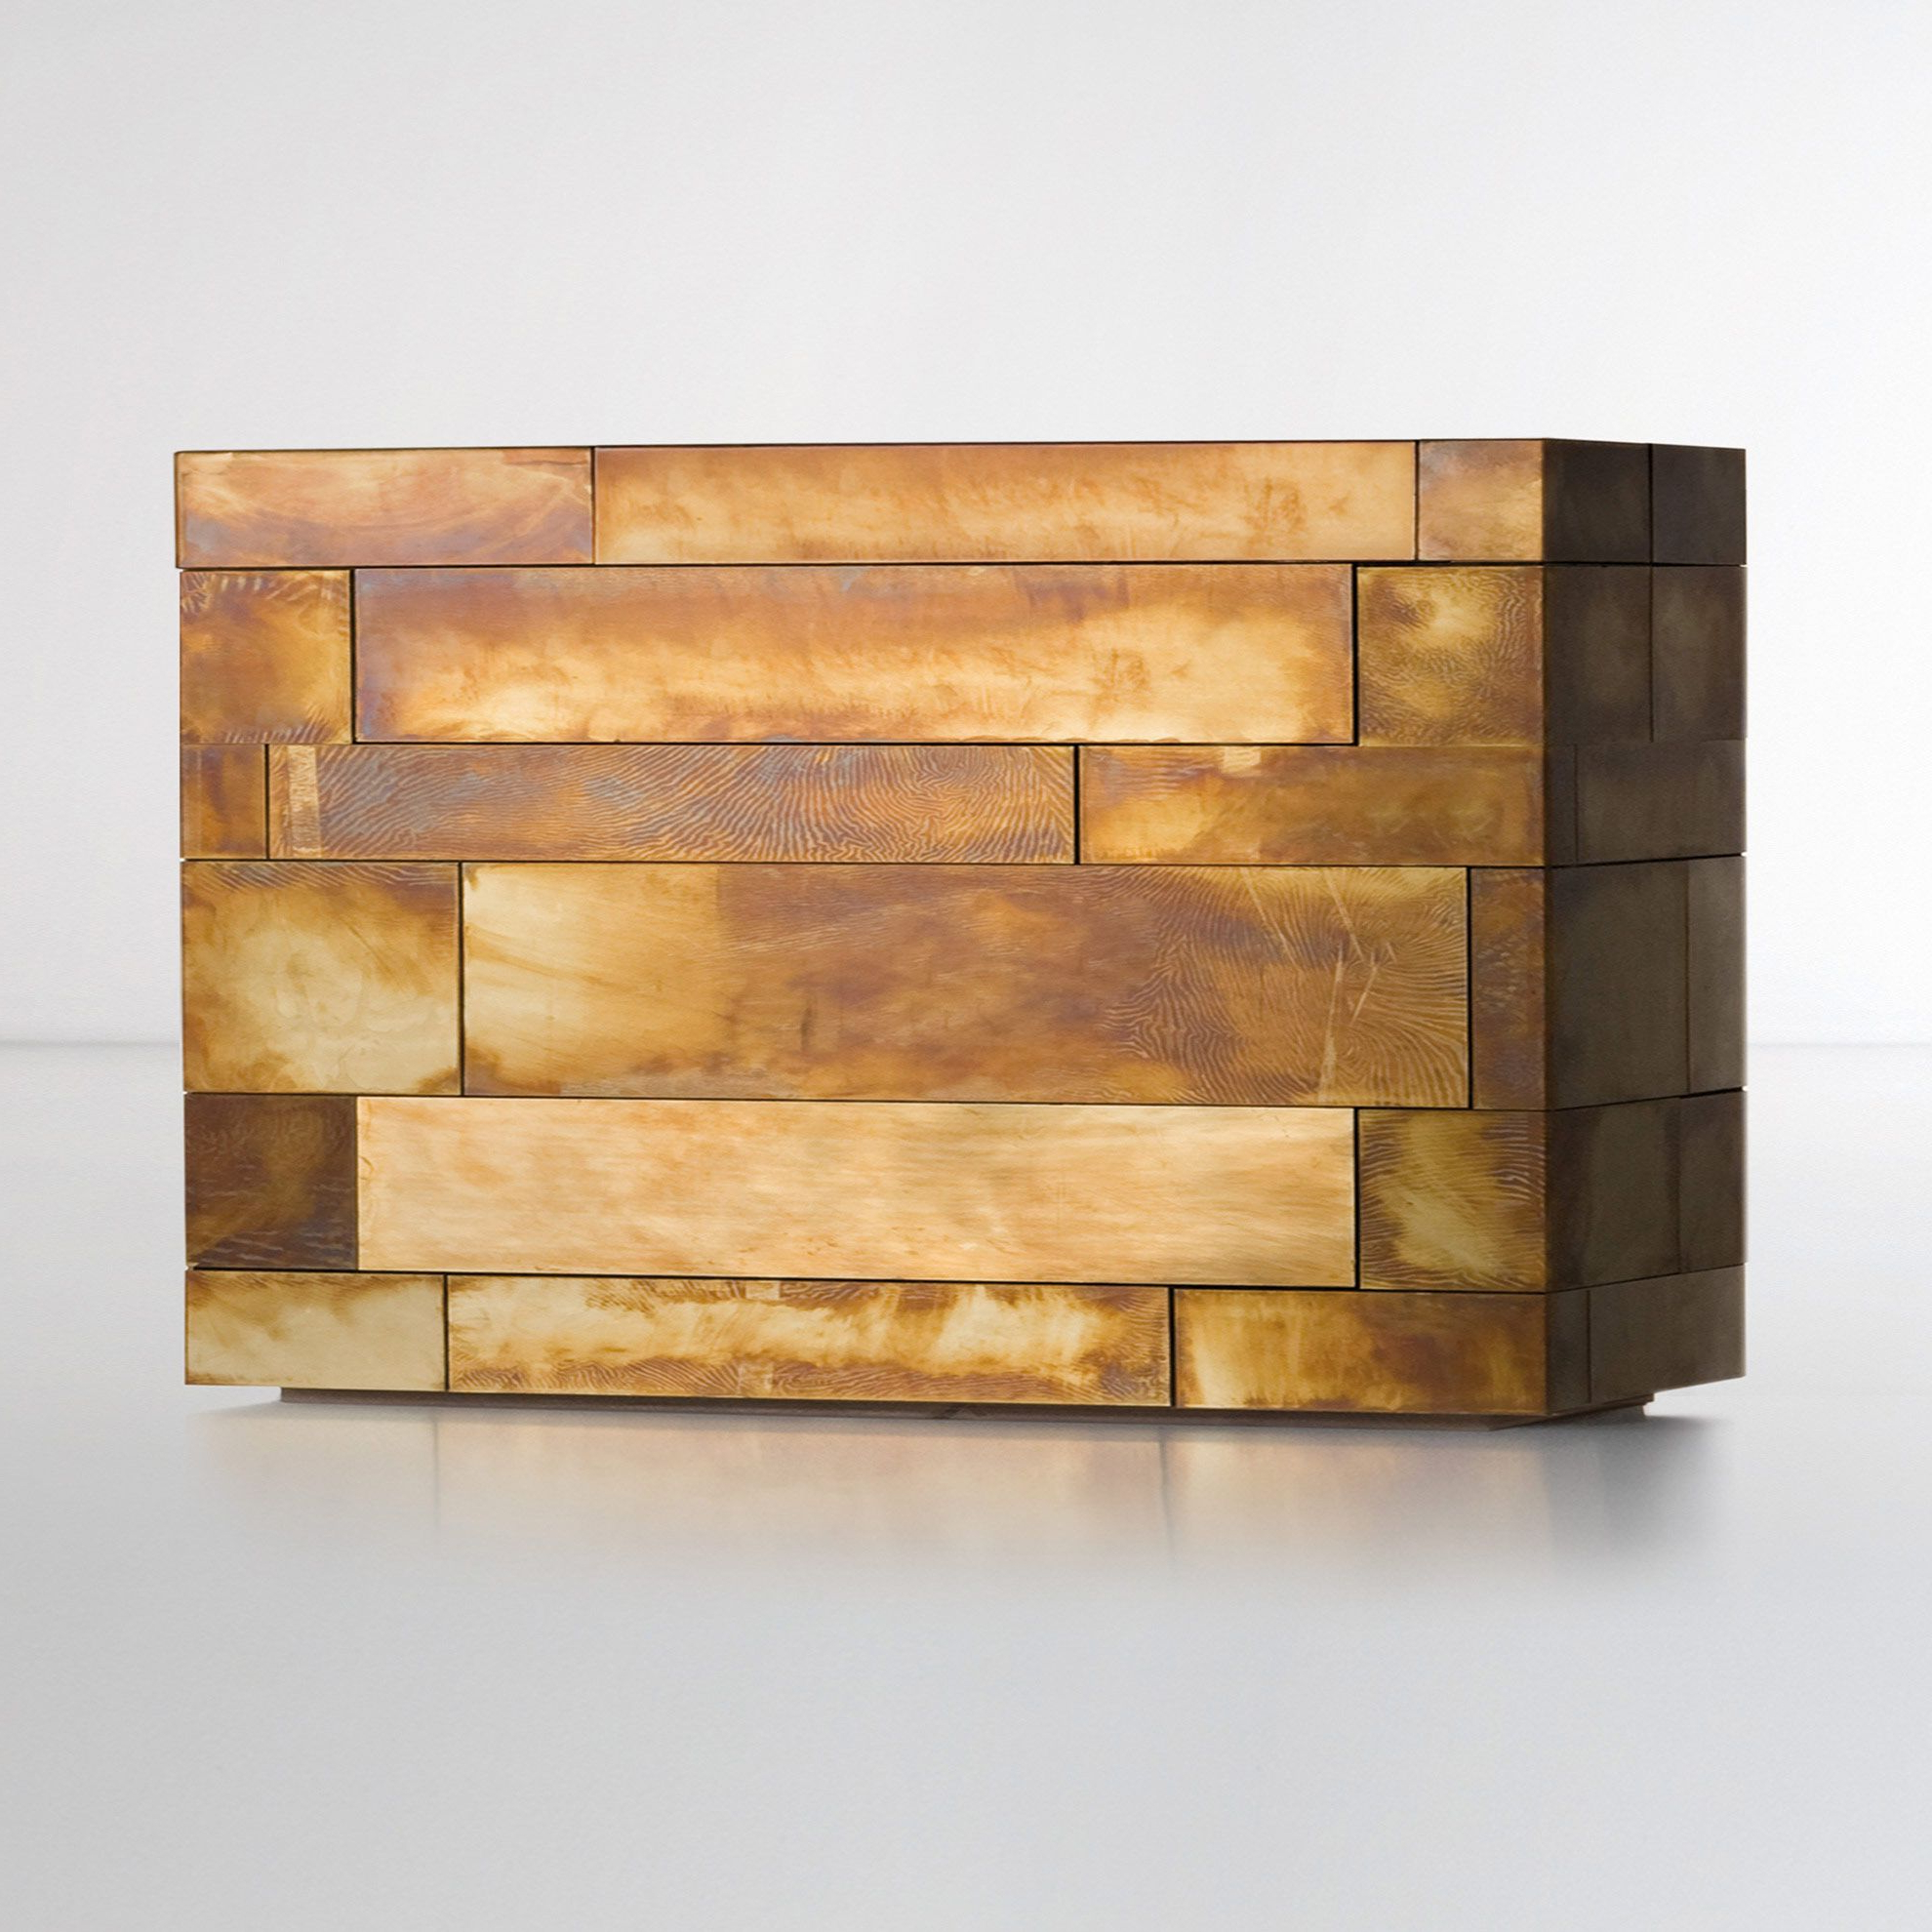 De Castelli Imaestri | Мебель, Свет | Мебель Regarding Castelli Sideboards (View 4 of 20)